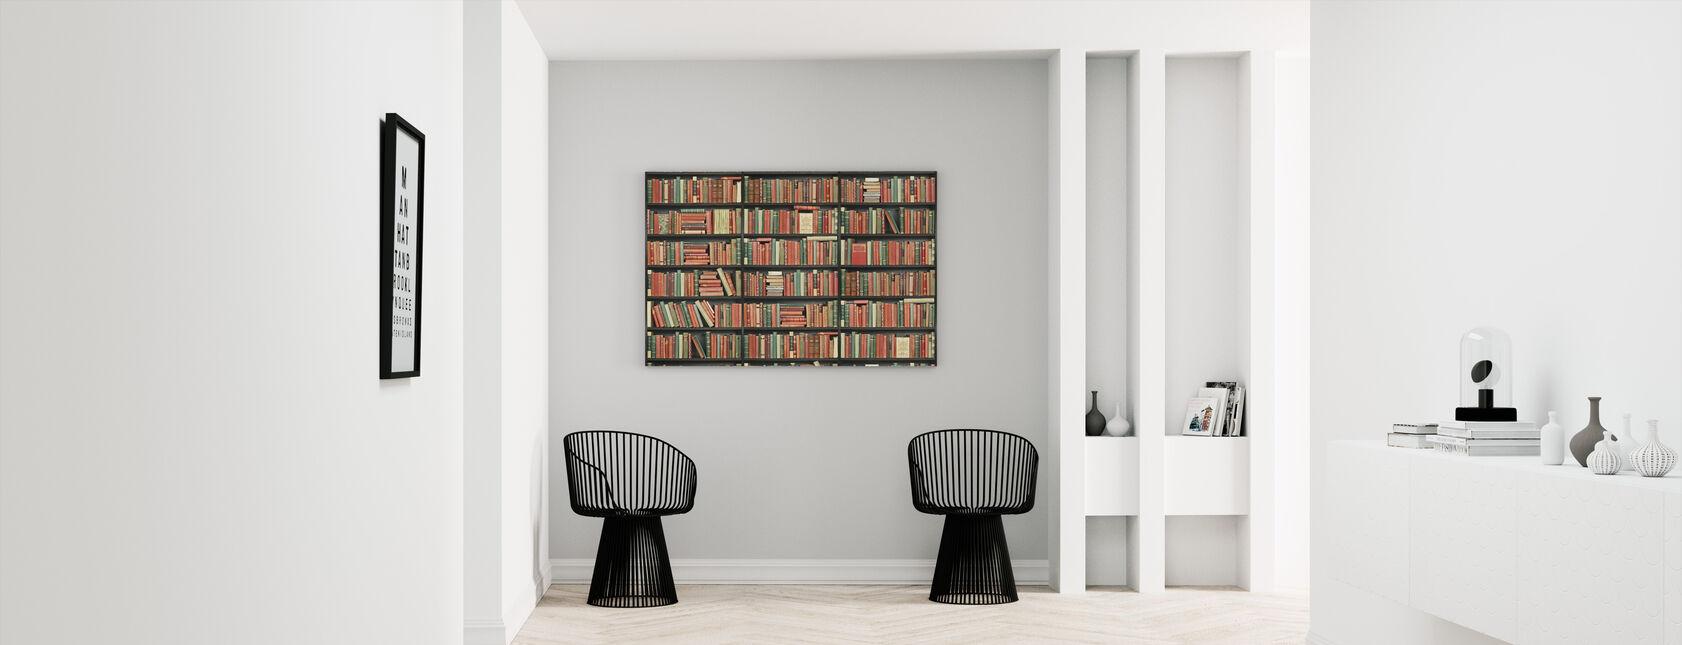 Bookshelf - Black - Red Green - Canvas print - Hallway